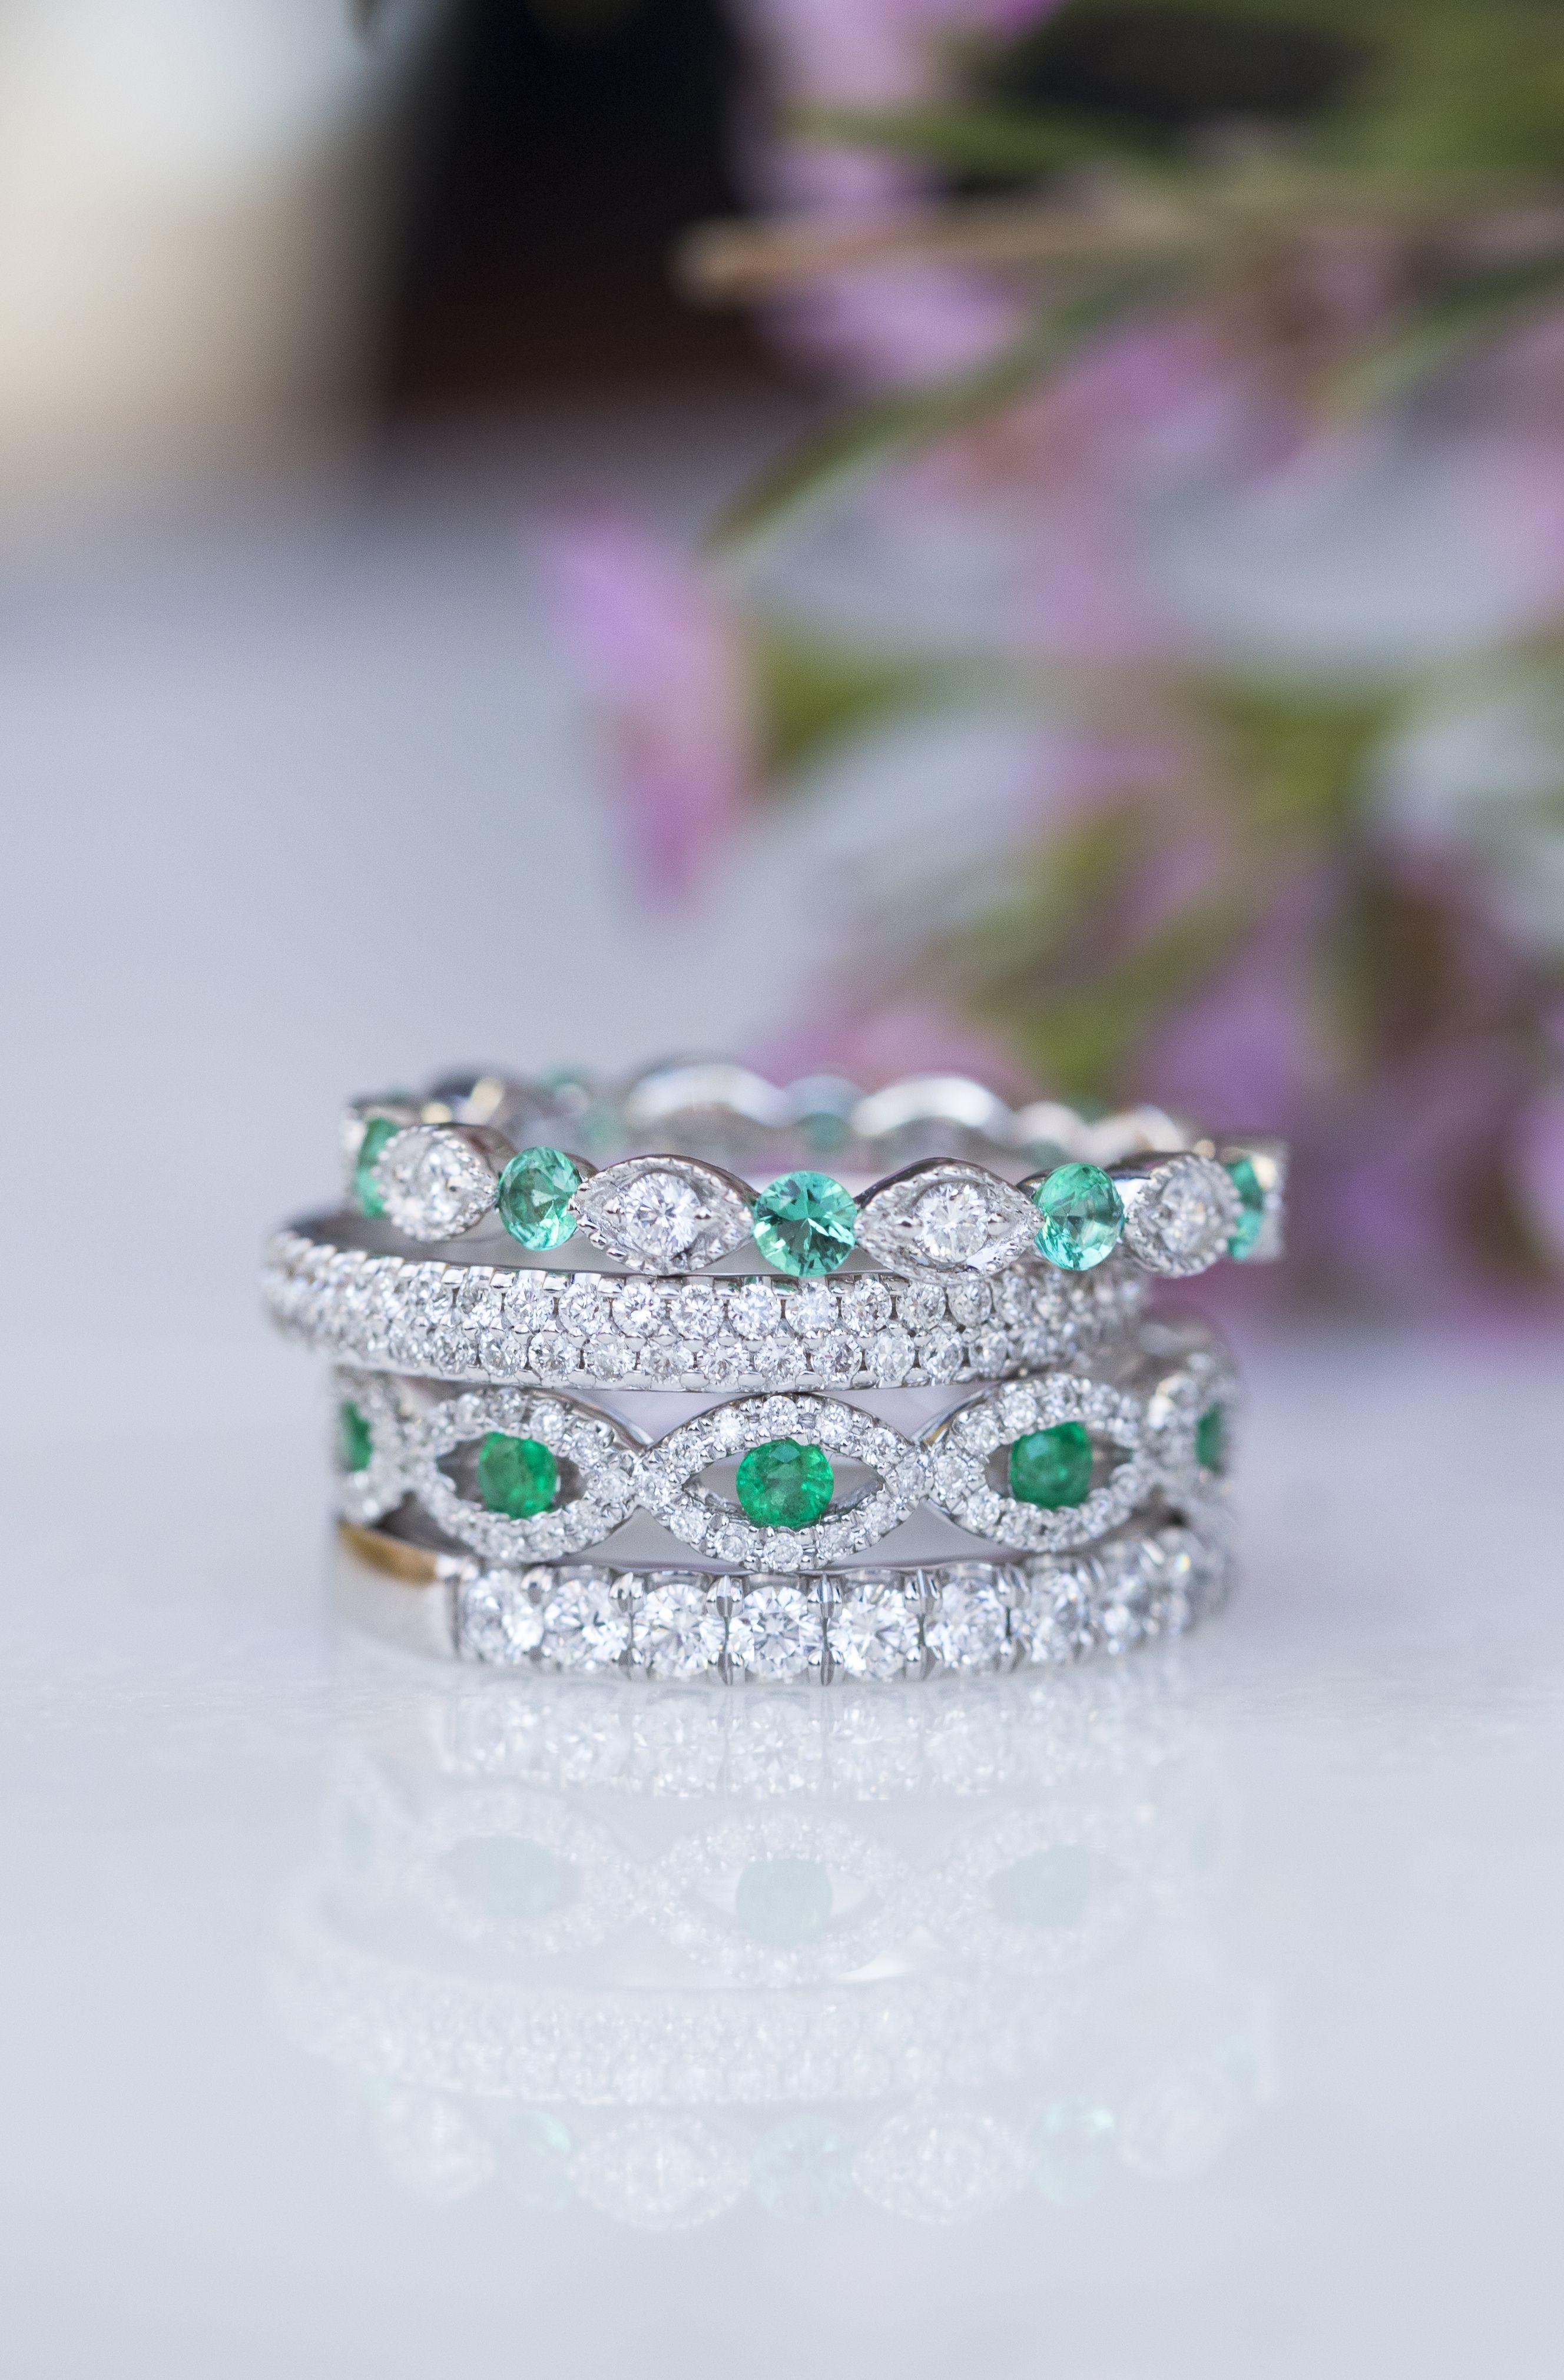 Diamond And Emerald Ring Stack Weddingband Anniversaryband Eternityring Diamondring Diamonds Emerald Band Ring Unique Diamond Rings Emerald Ring